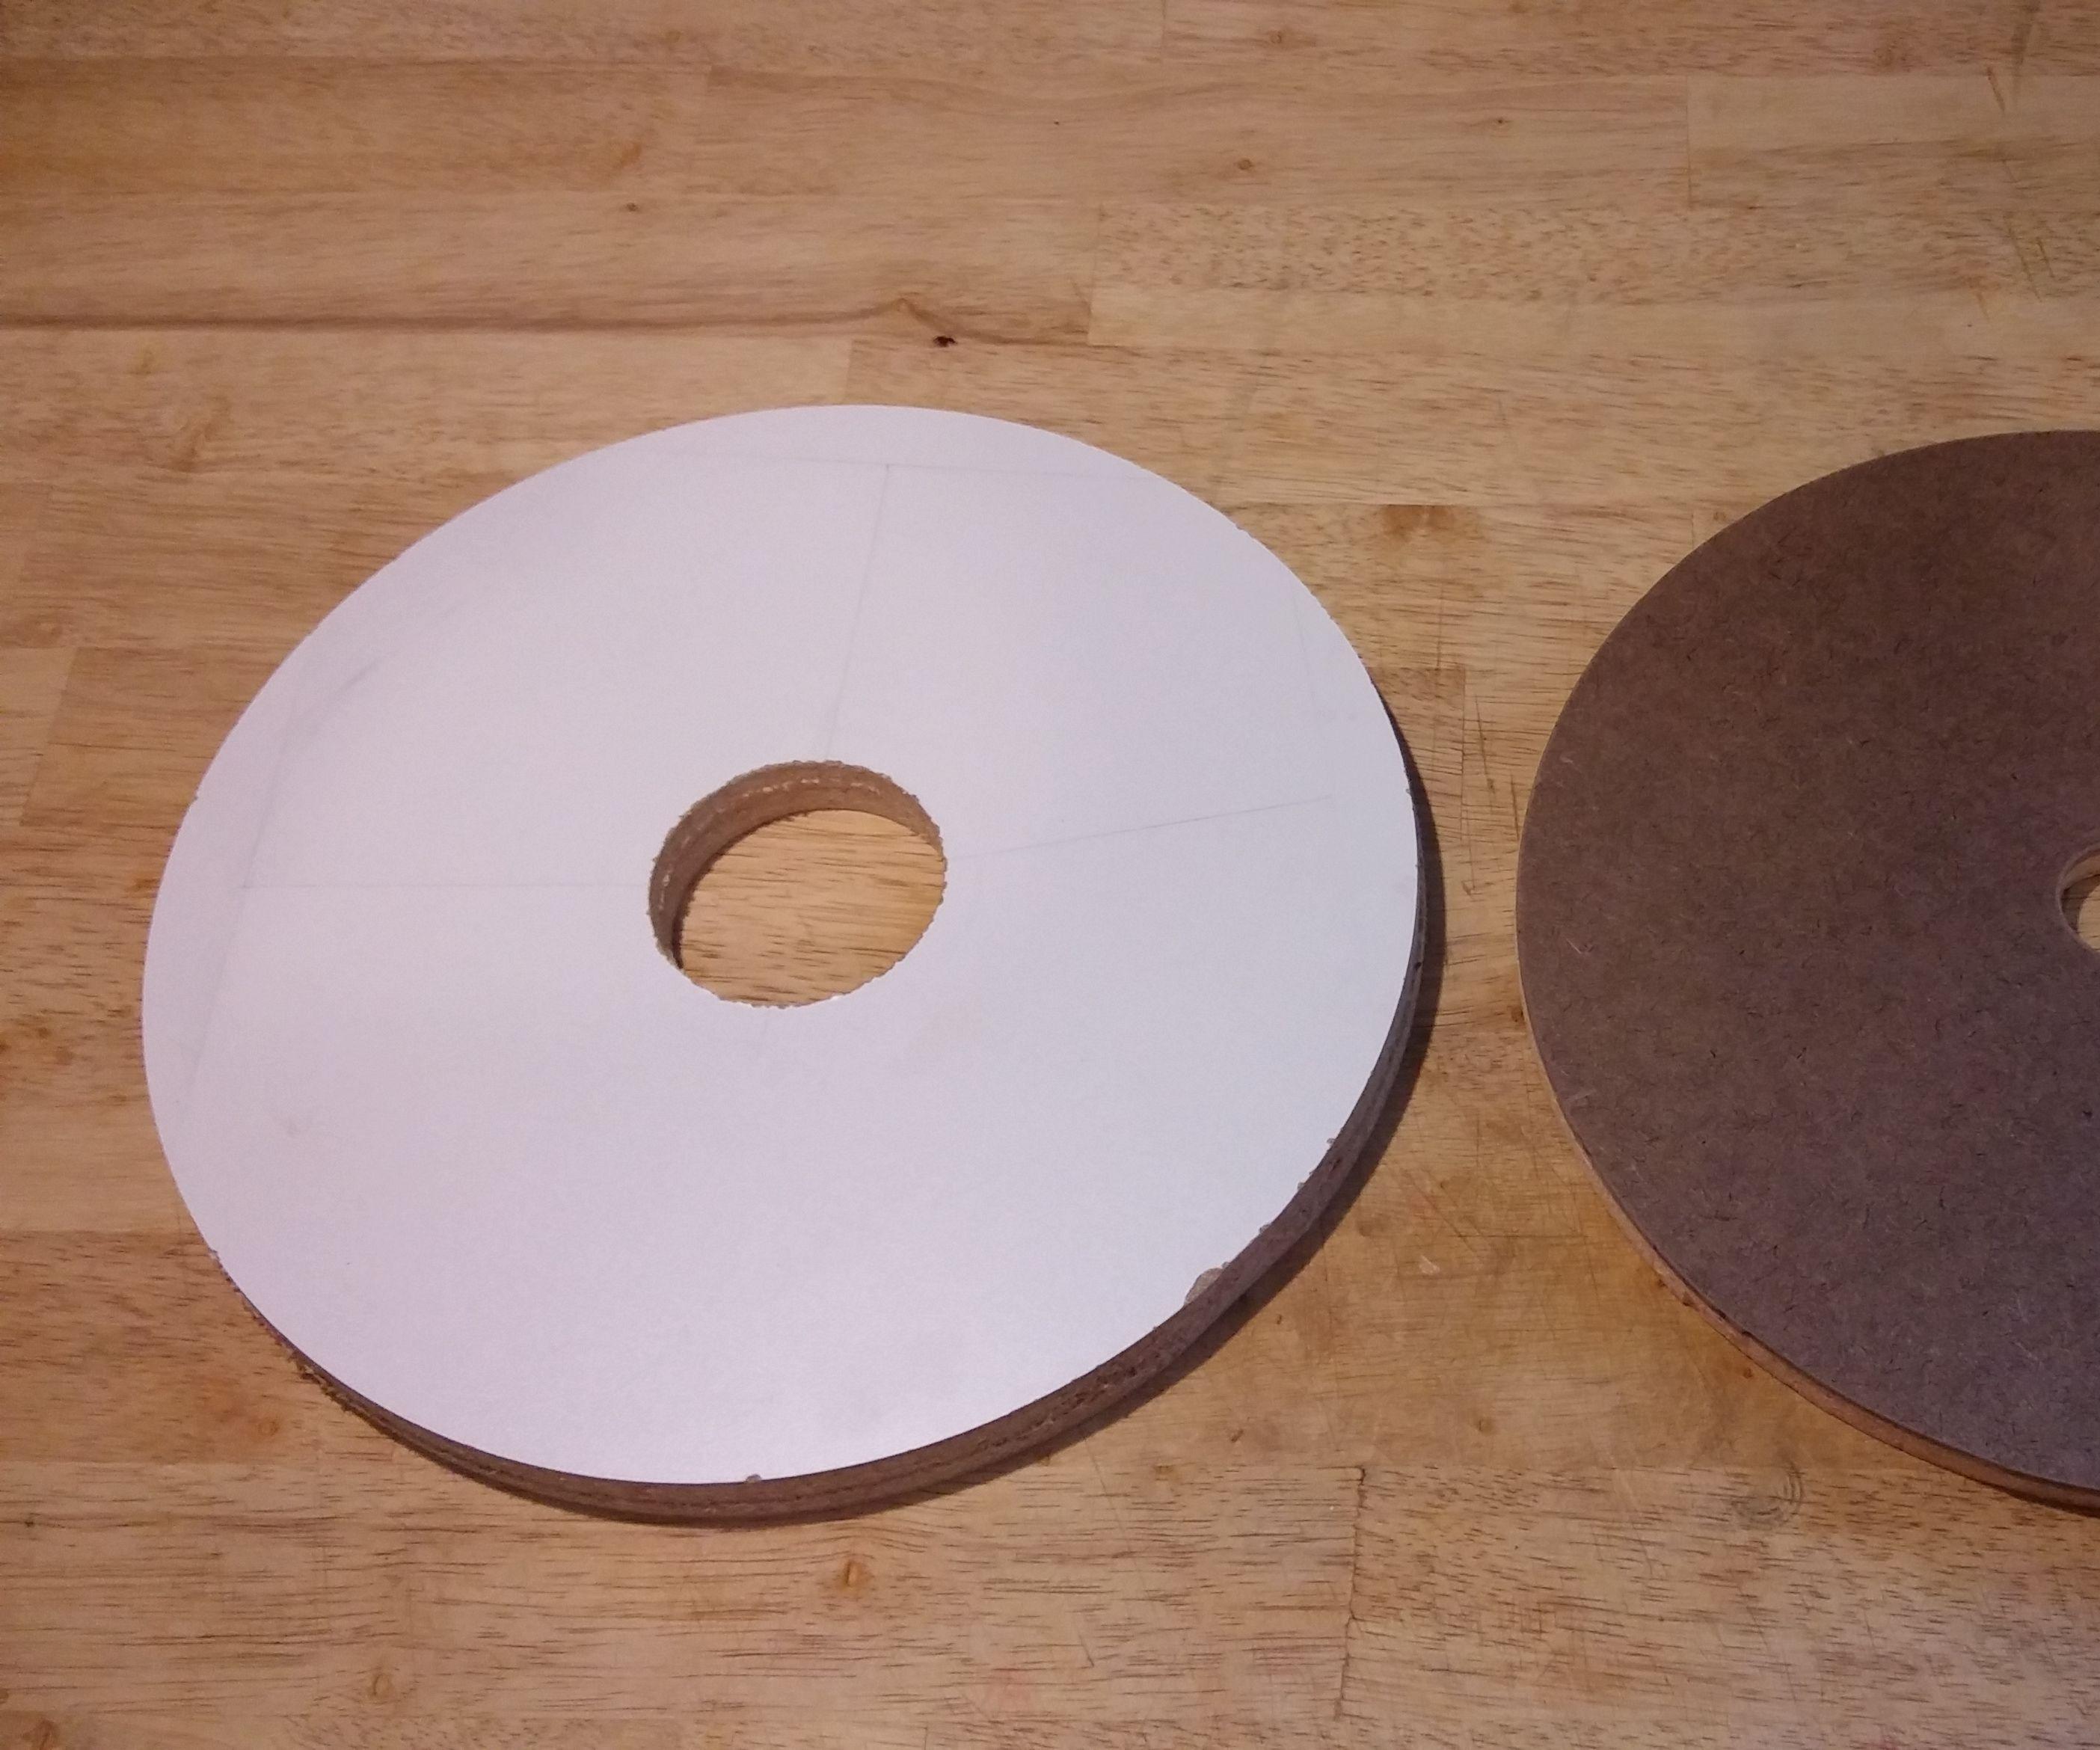 Drill Press Sanding Plates